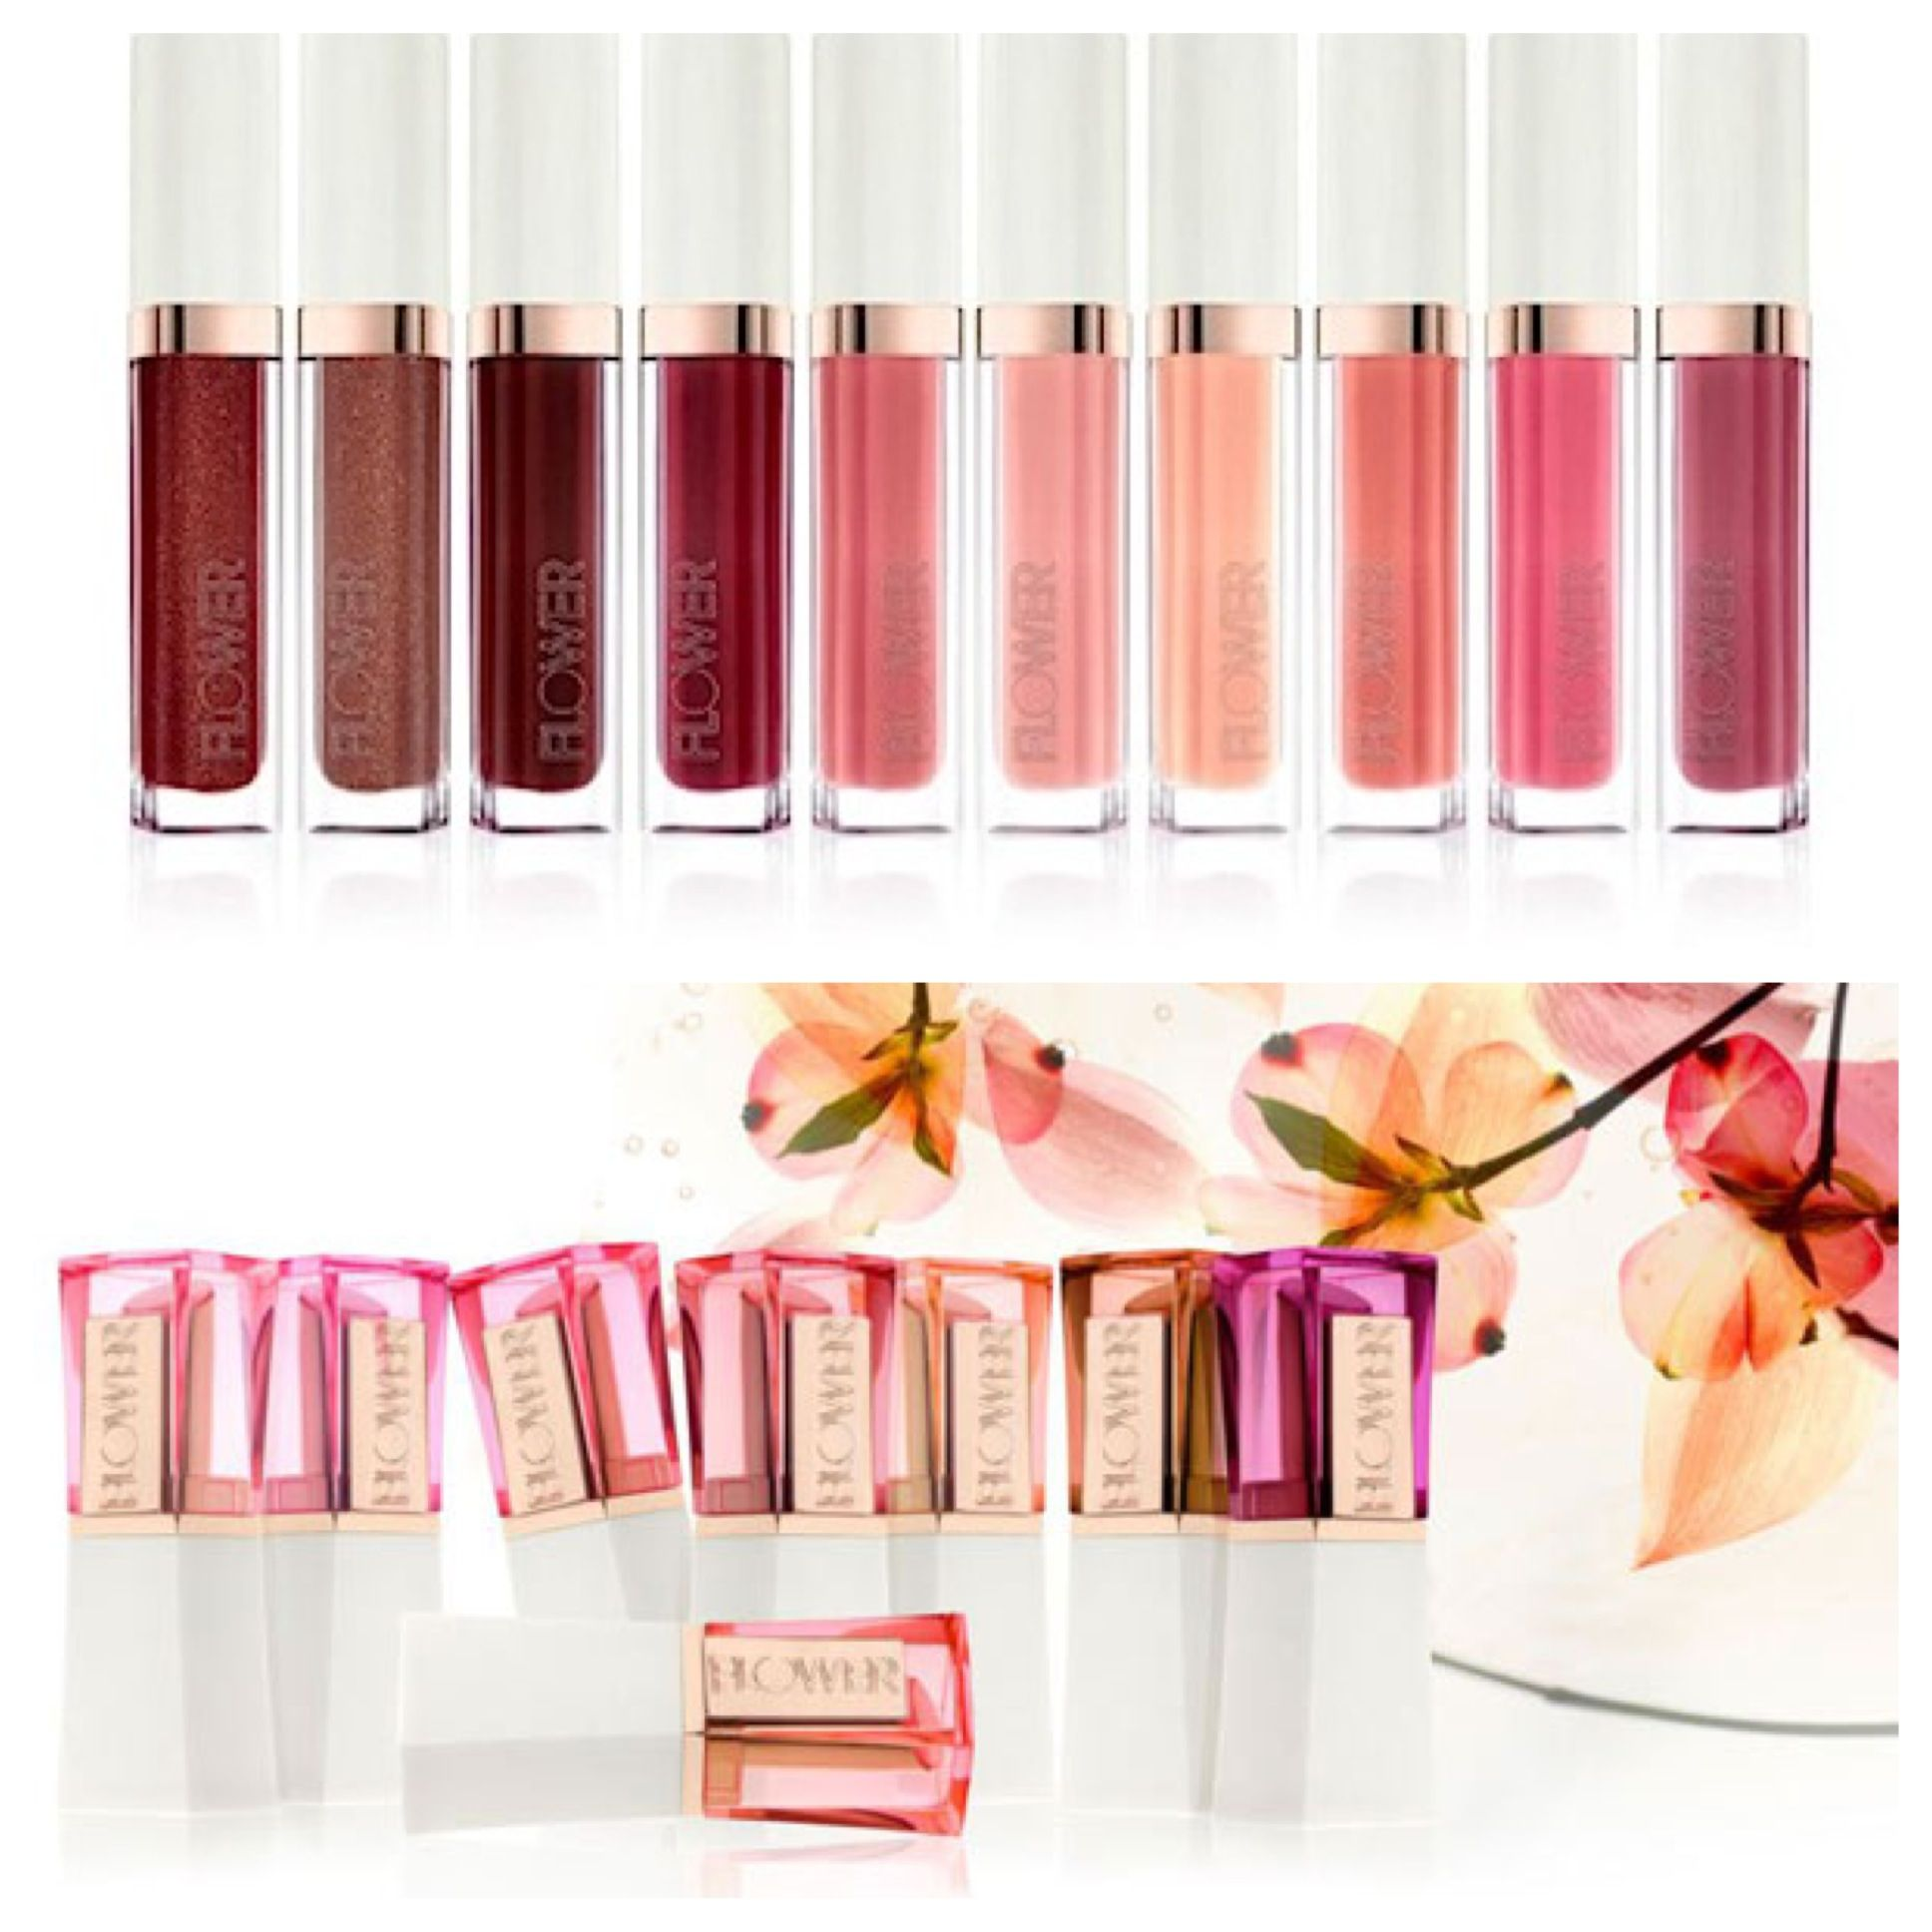 Flower Beauty Makeup Cosmetics By Drew Barrymore Flower Makeup